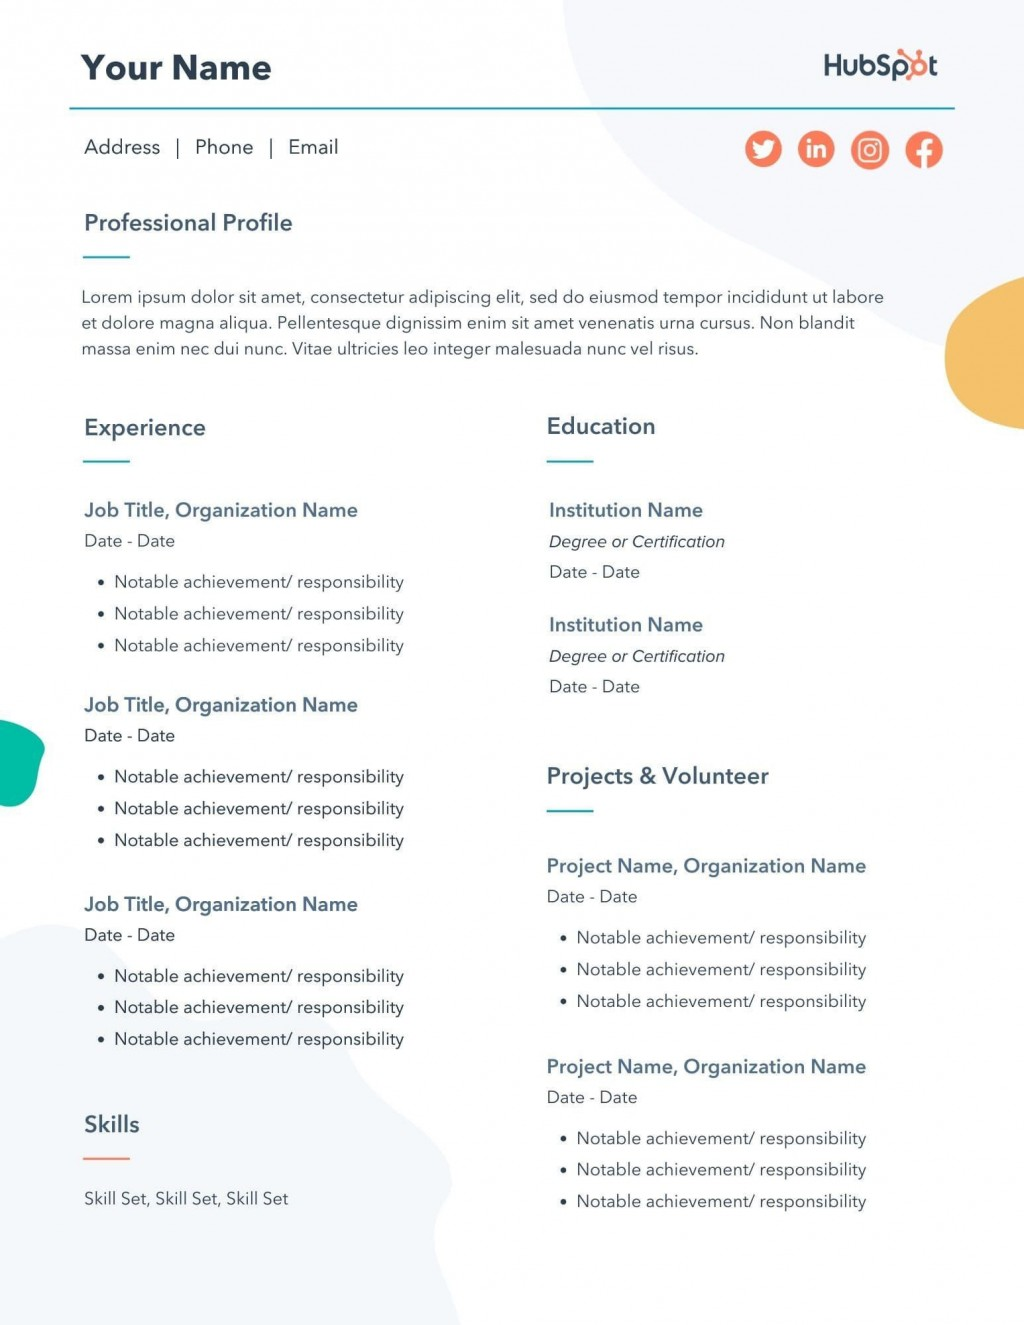 009 Shocking Download Resume Sample Free High Definition  Teacher Cv Graphic Designer Word Format Nurse TemplateLarge